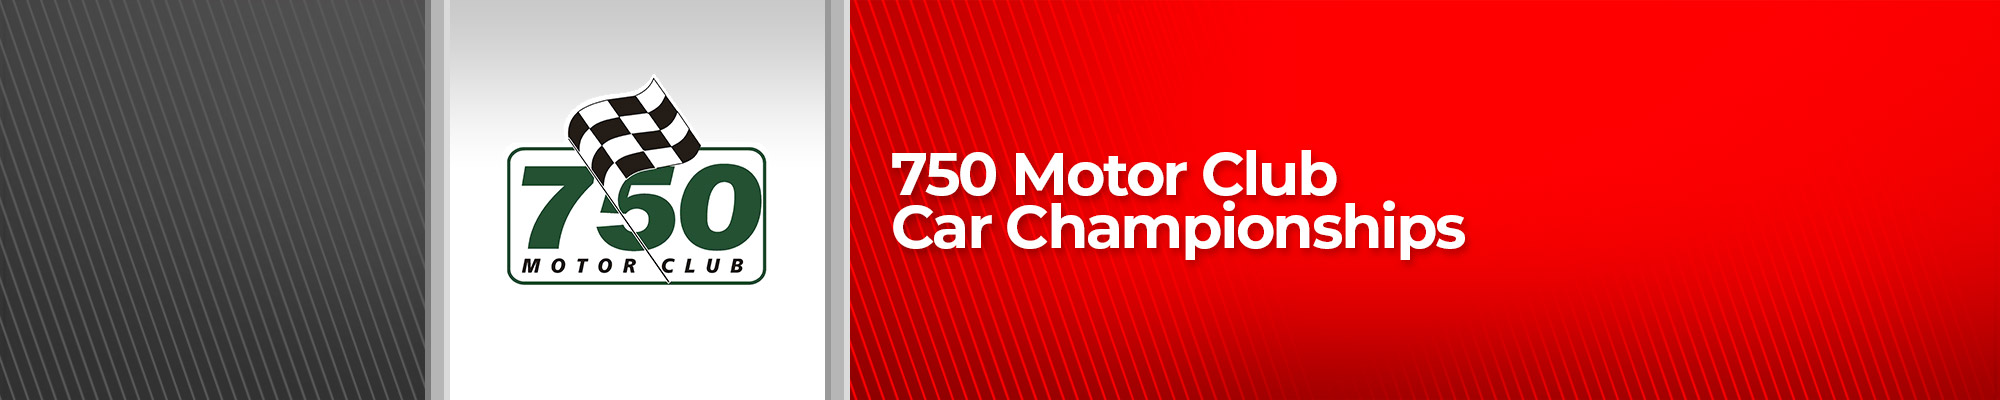 750 Motor Club Car Championships - POSTPONED